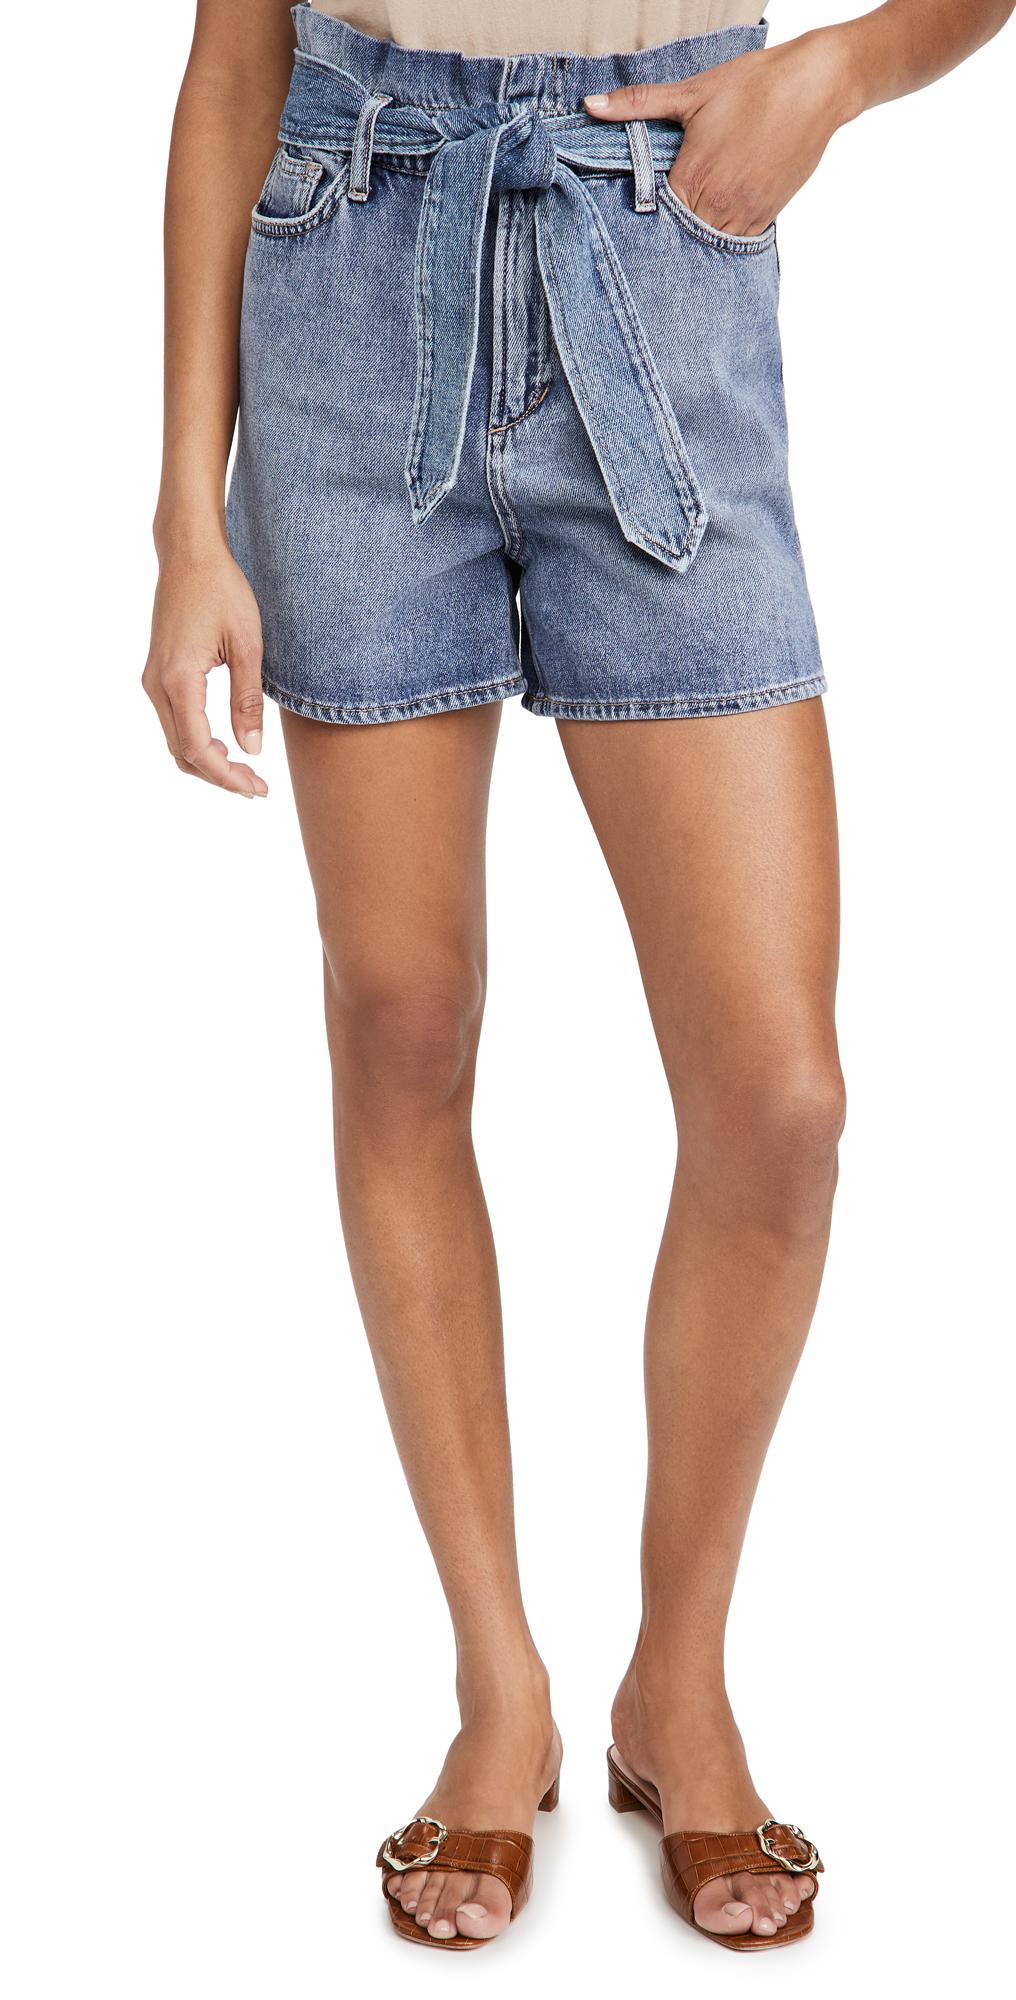 Joe's Jeans The Brinkley Shorts